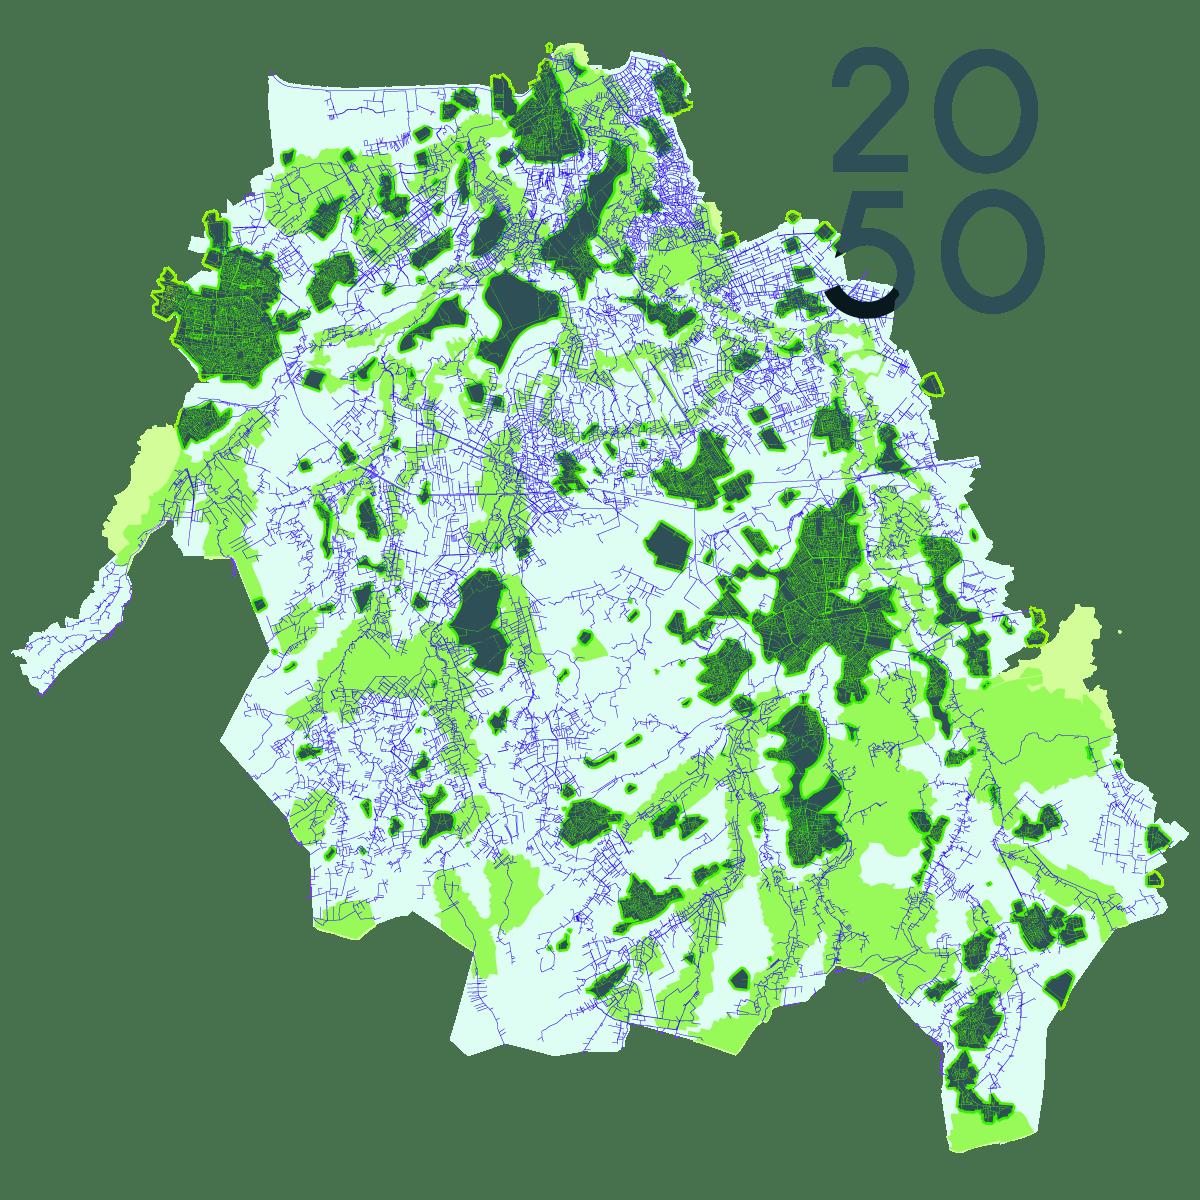 sponspleinen-2050